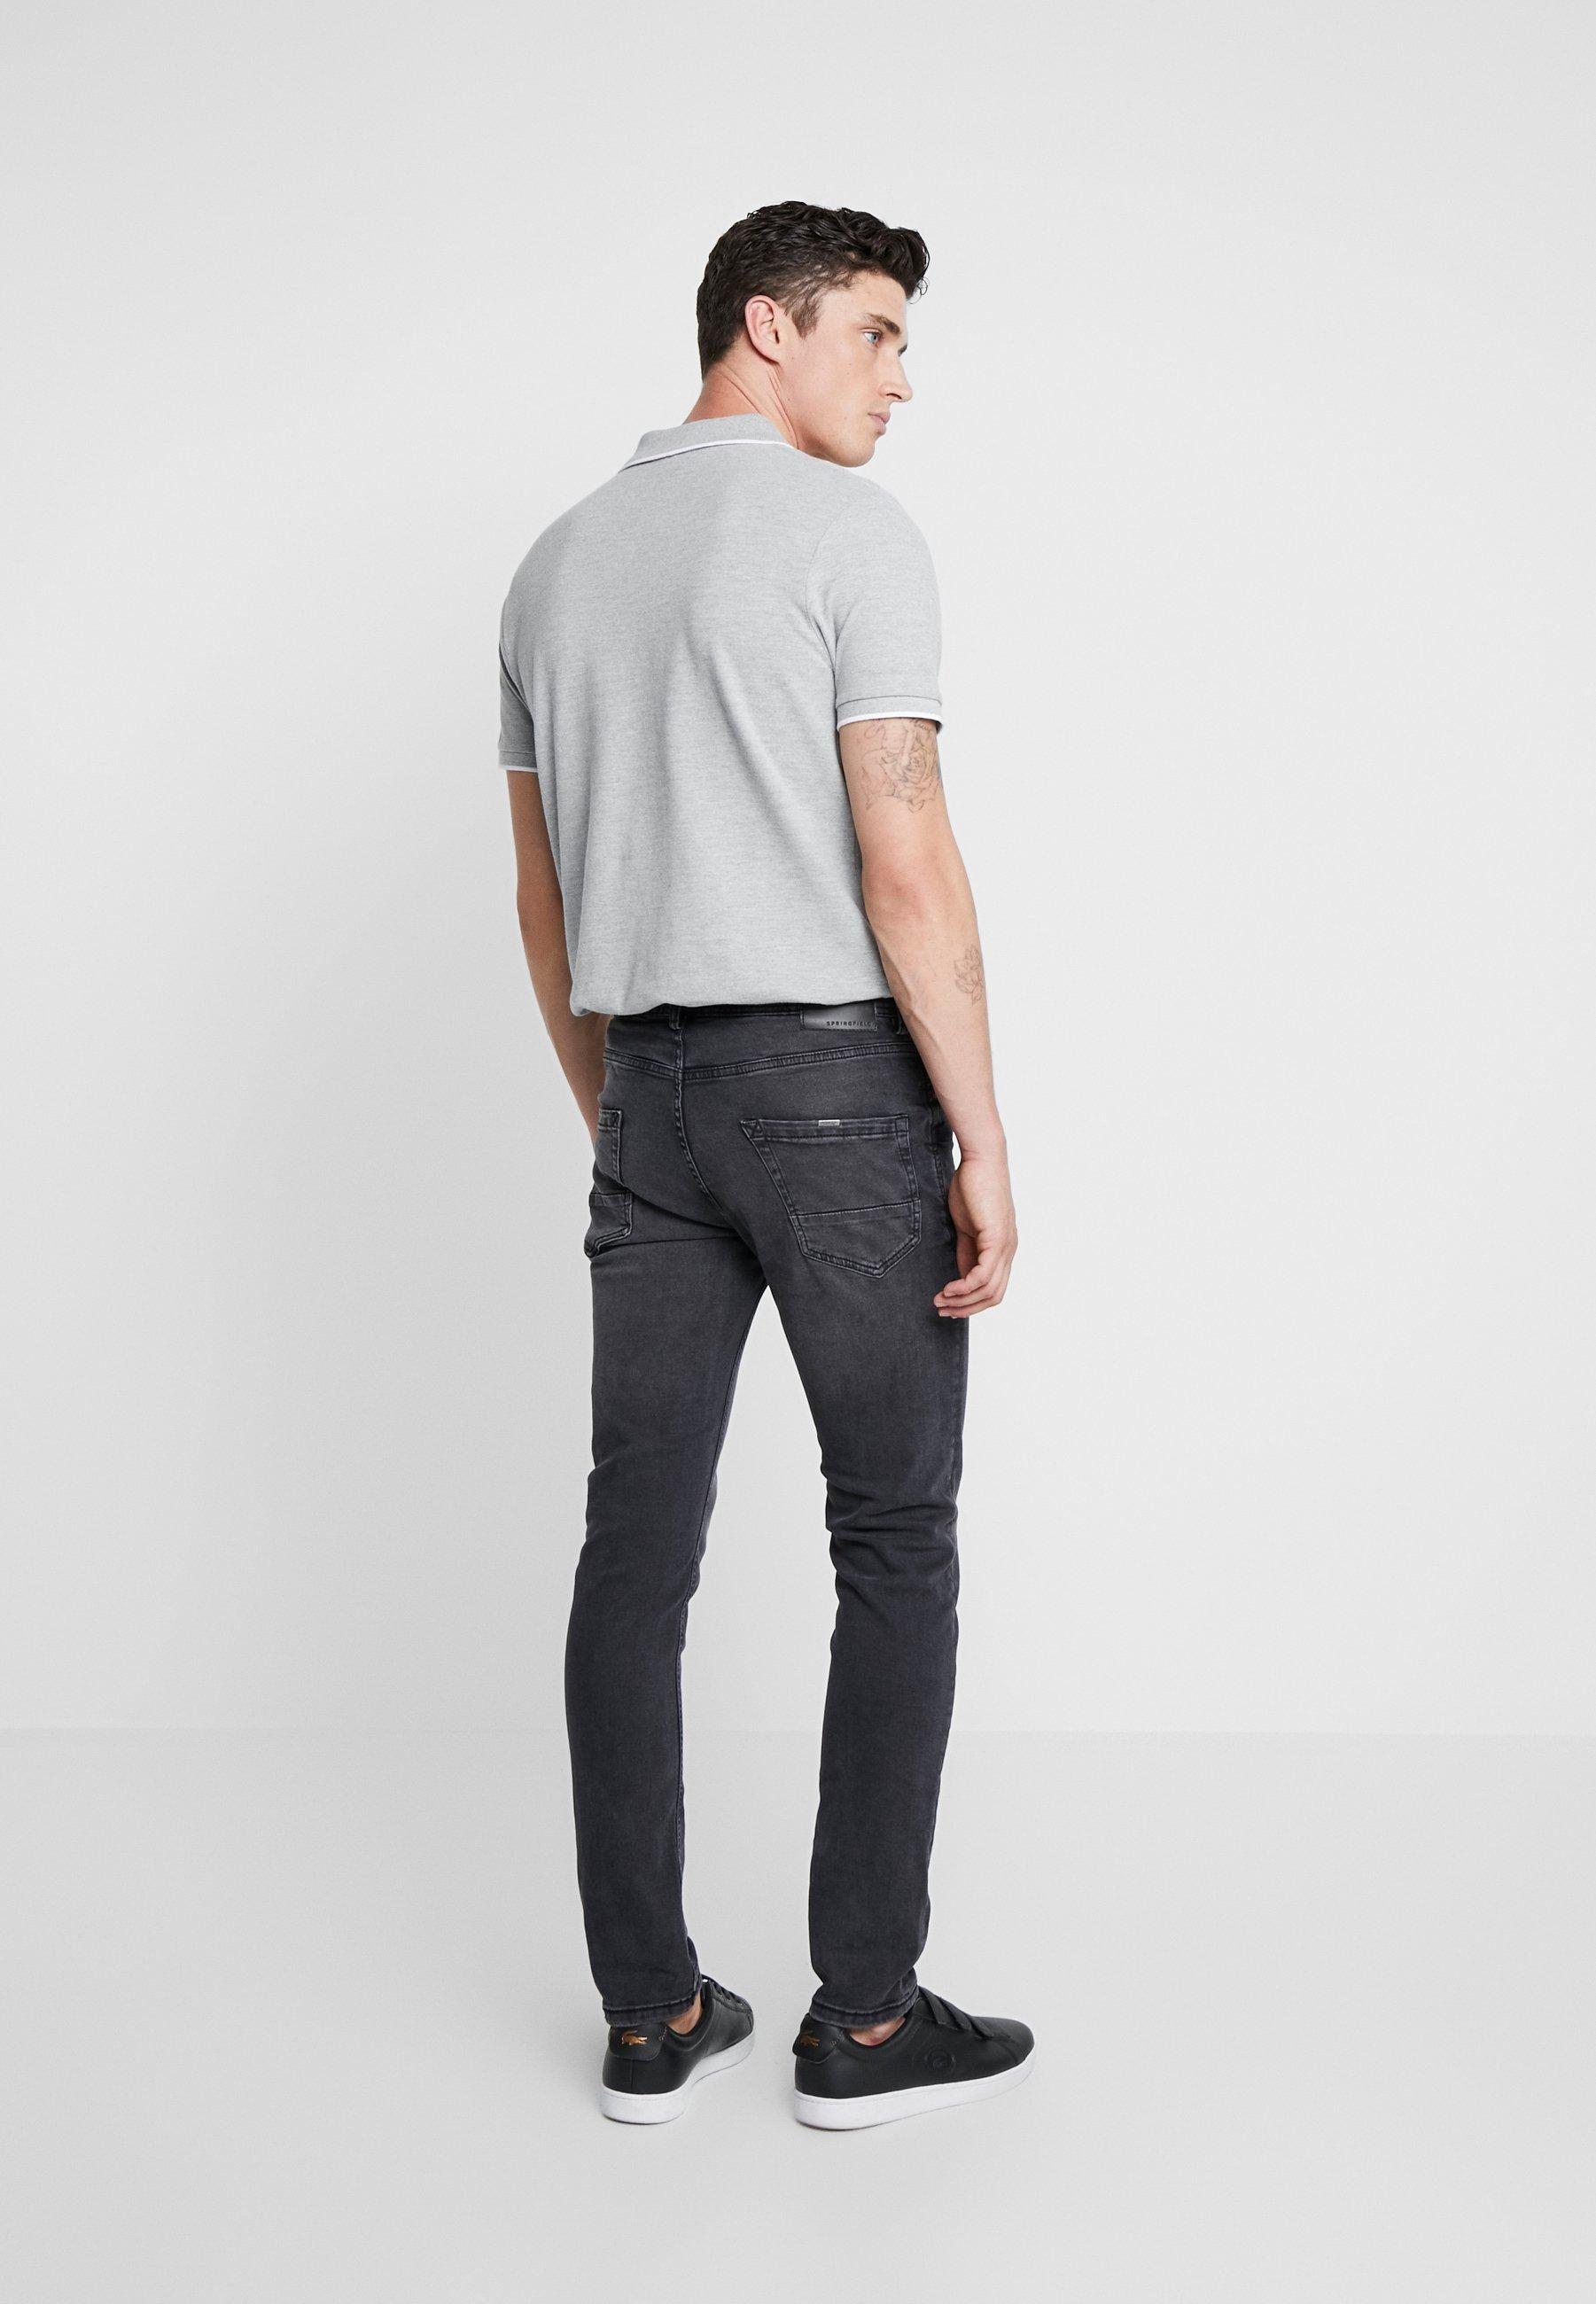 Jeans SkinnyBlack SkinnyBlack Springfield Springfield Springfield Jeans Jeans KcT1FlJ3